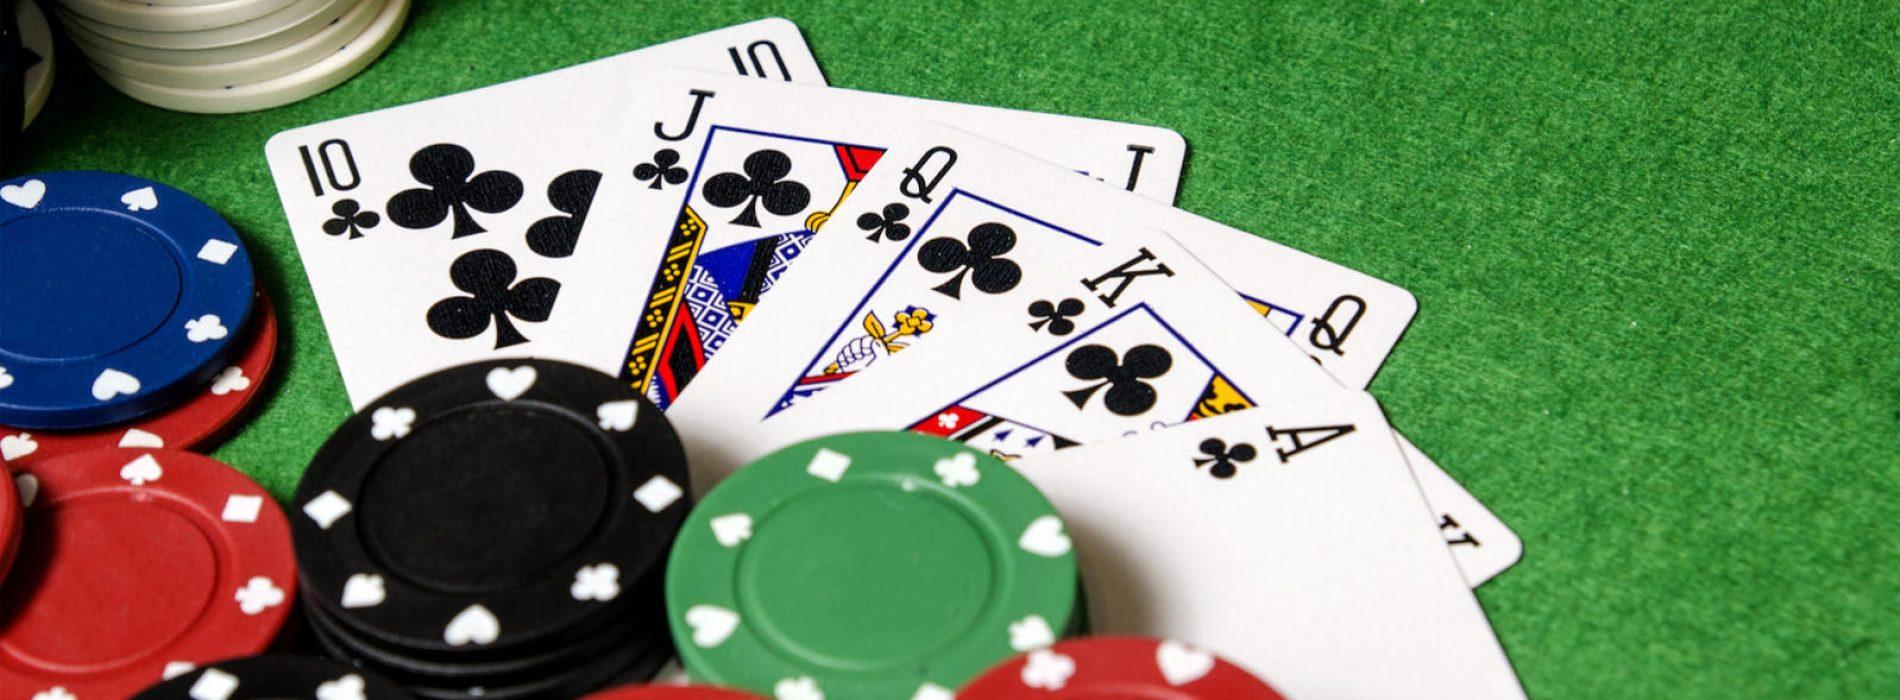 JOKER123: play on various gaming slots and win money!!